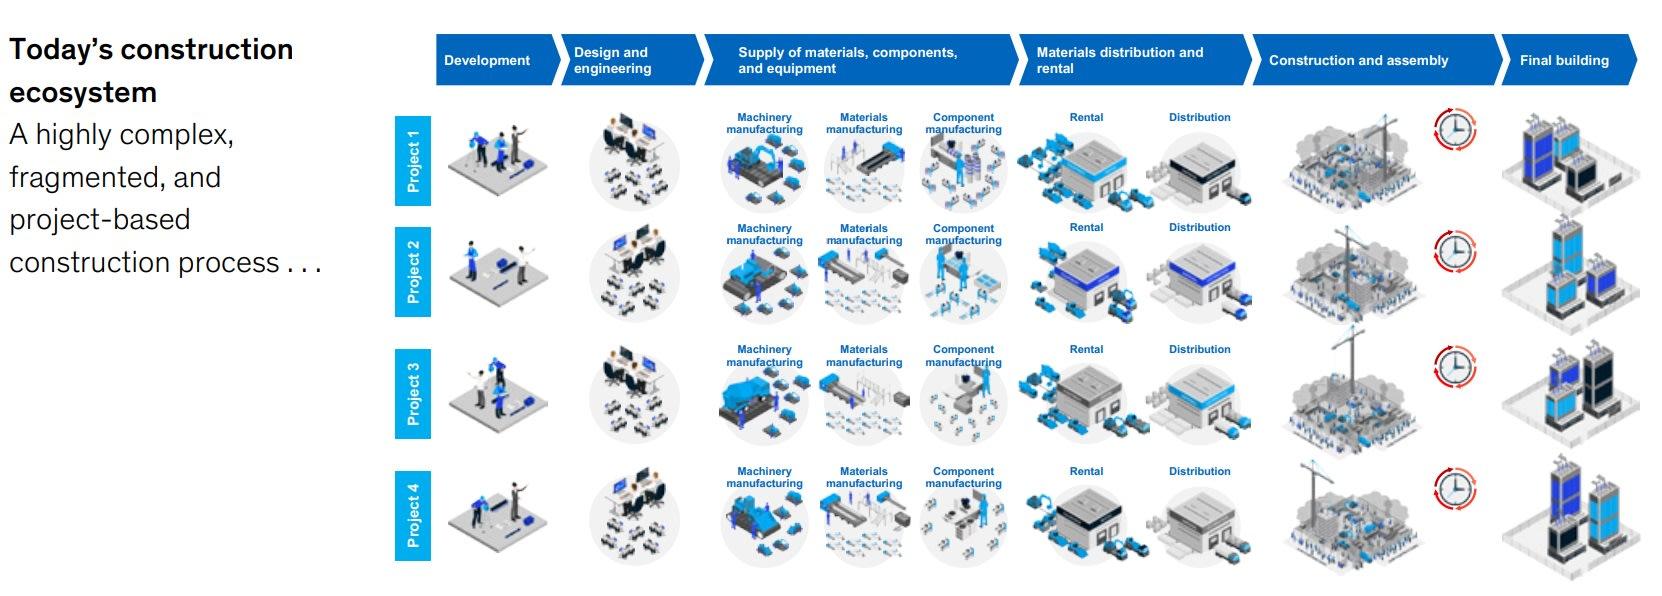 Modern construction ecosystem diagram